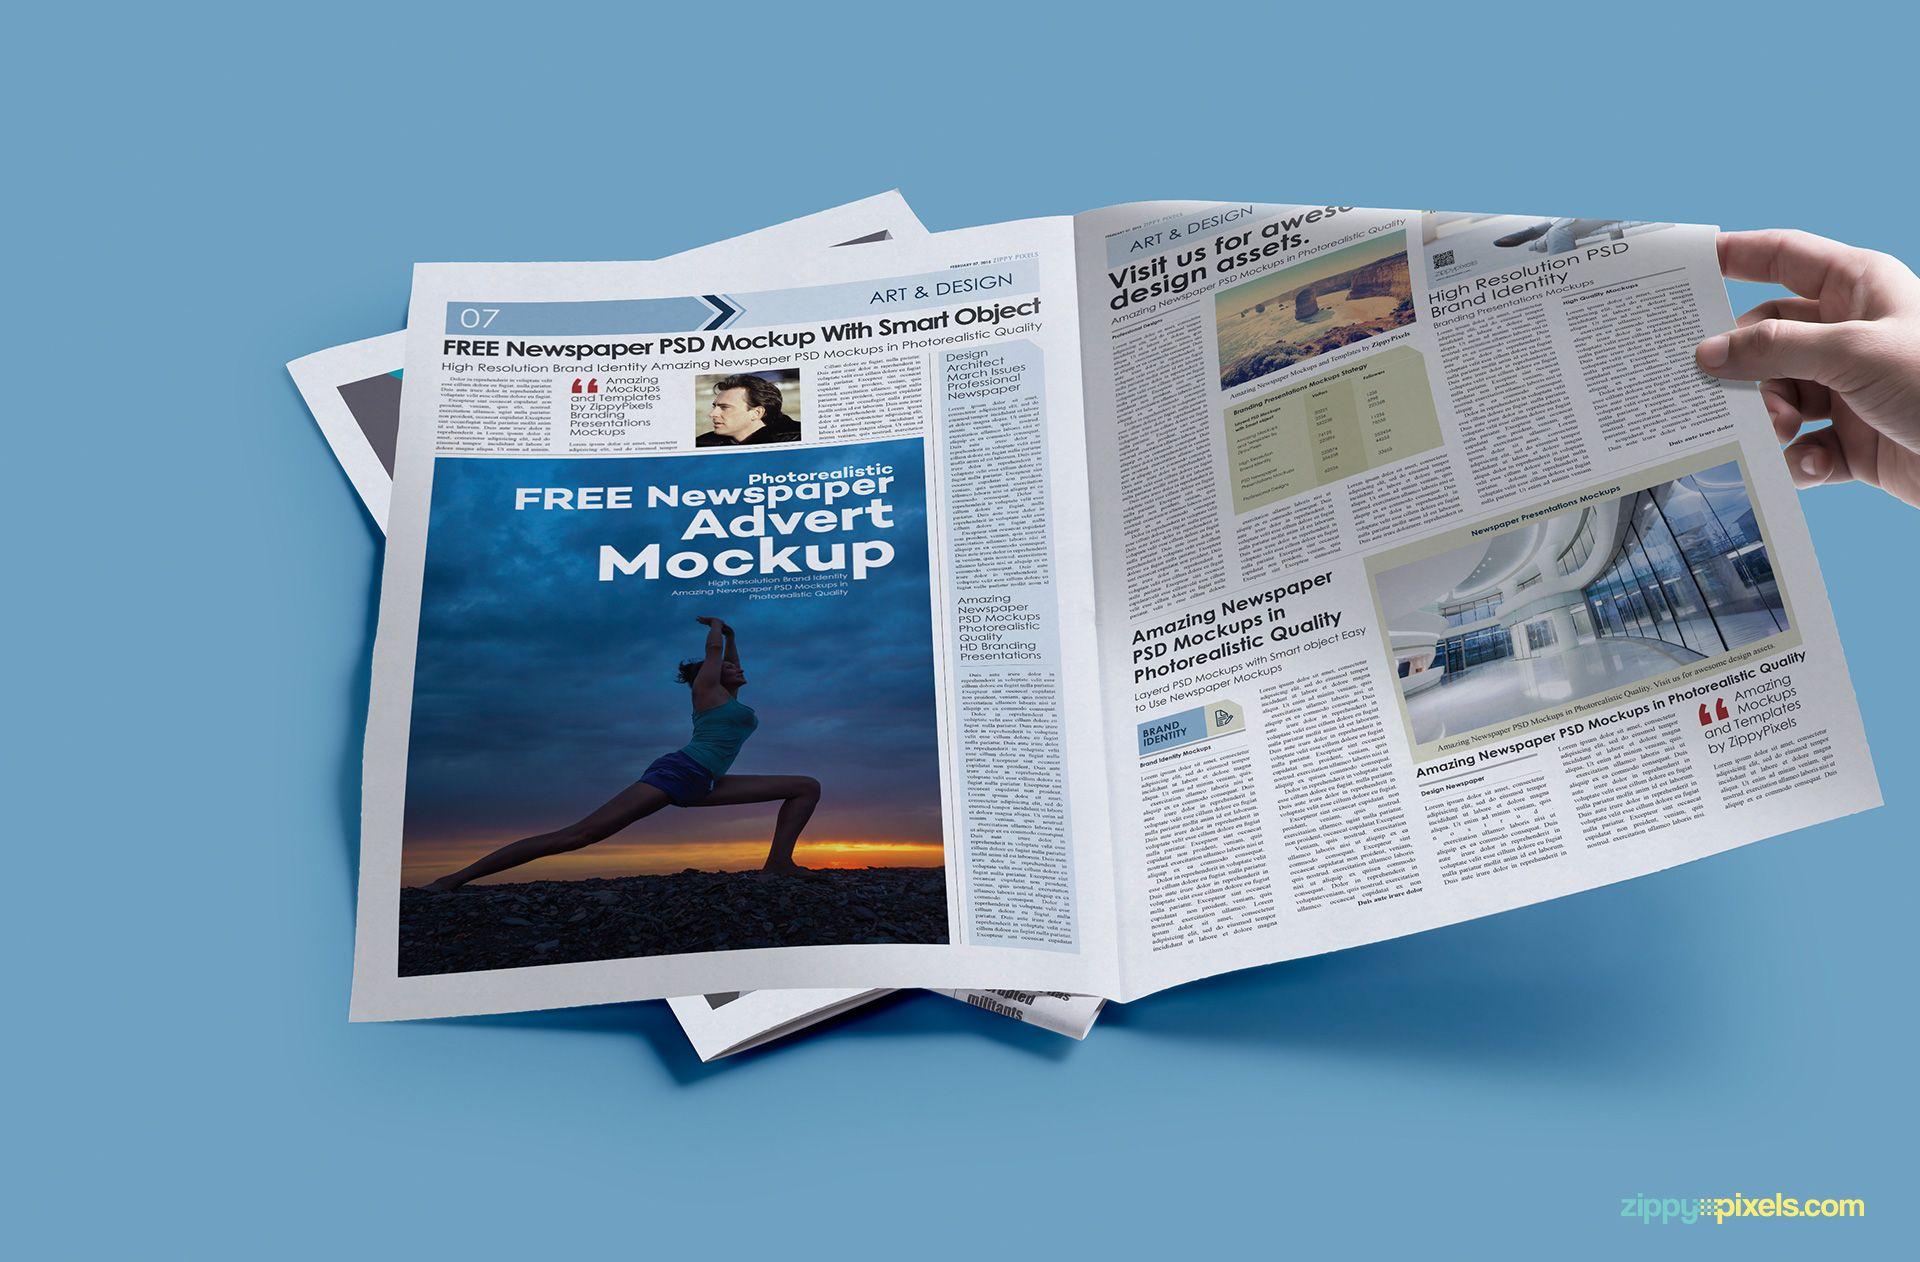 Free Print Ad Mockup Psd Print Ads Free Mockup Photoshop